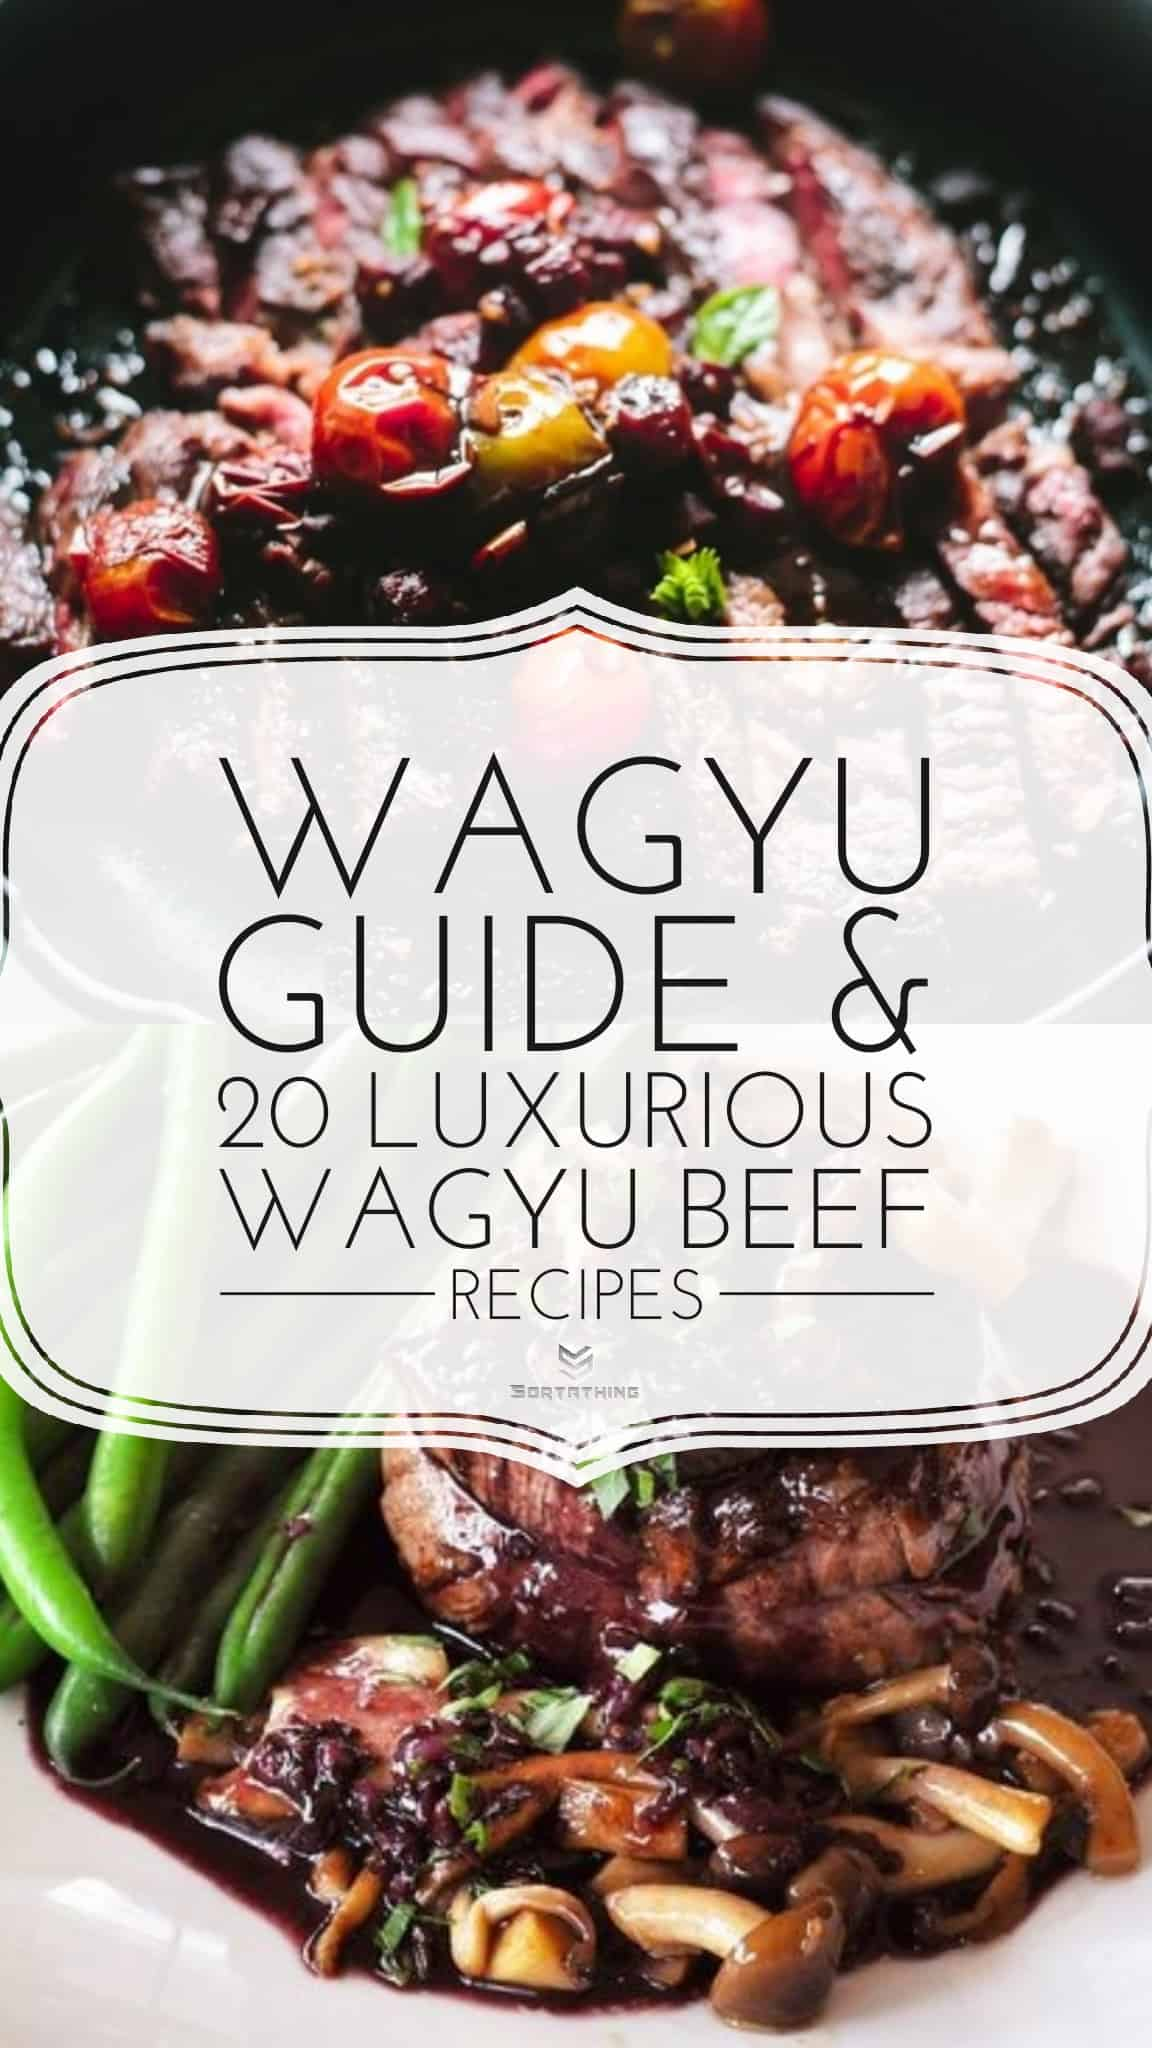 Wagyu Brisket and Wagyu Filet Mignon